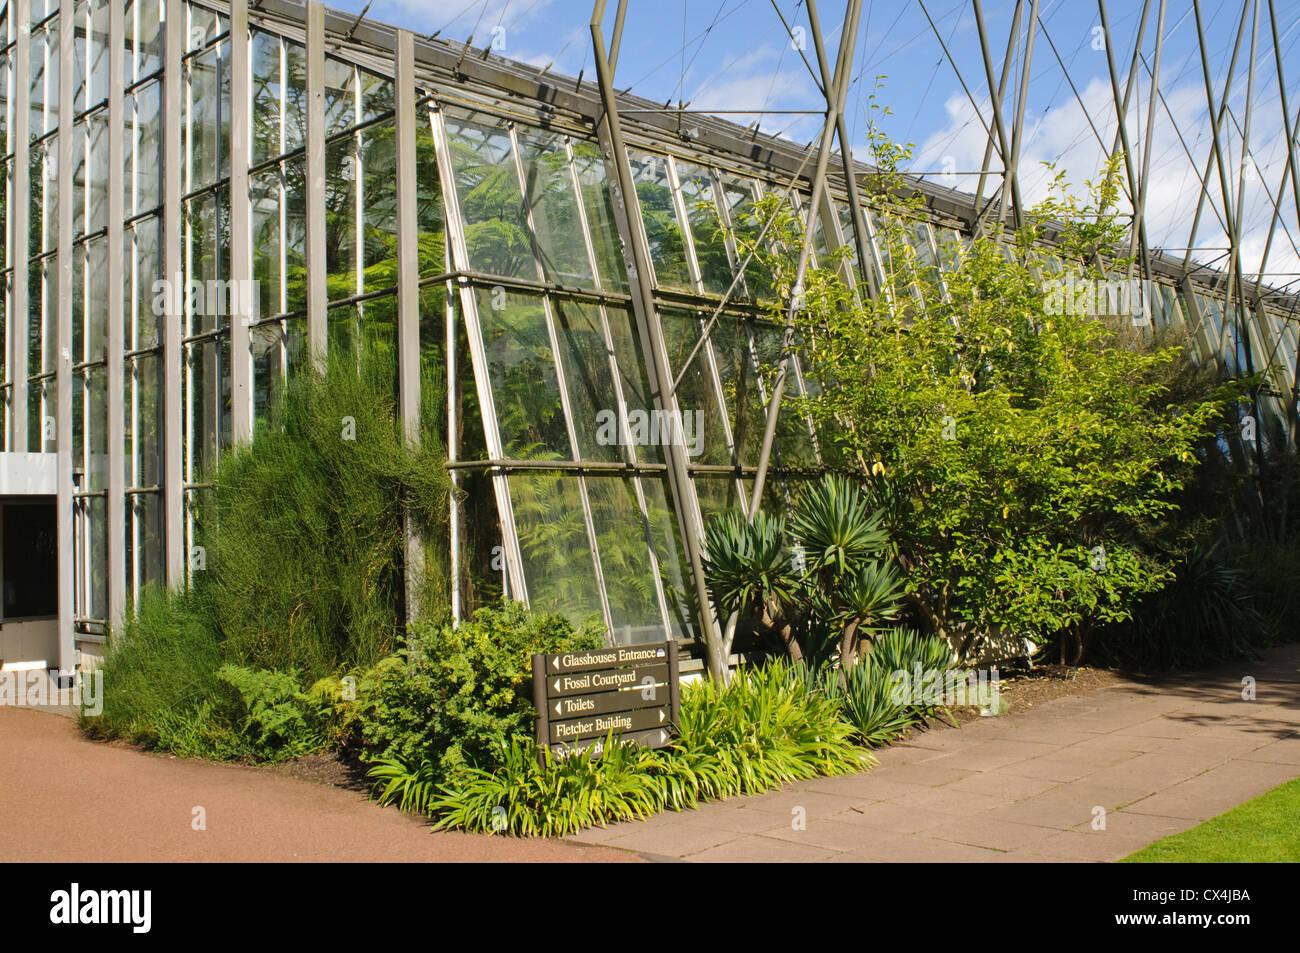 Royal Botanic Garden Edinburgh Glasshouse Stock Photo Royalty Free Image 50504030 Alamy